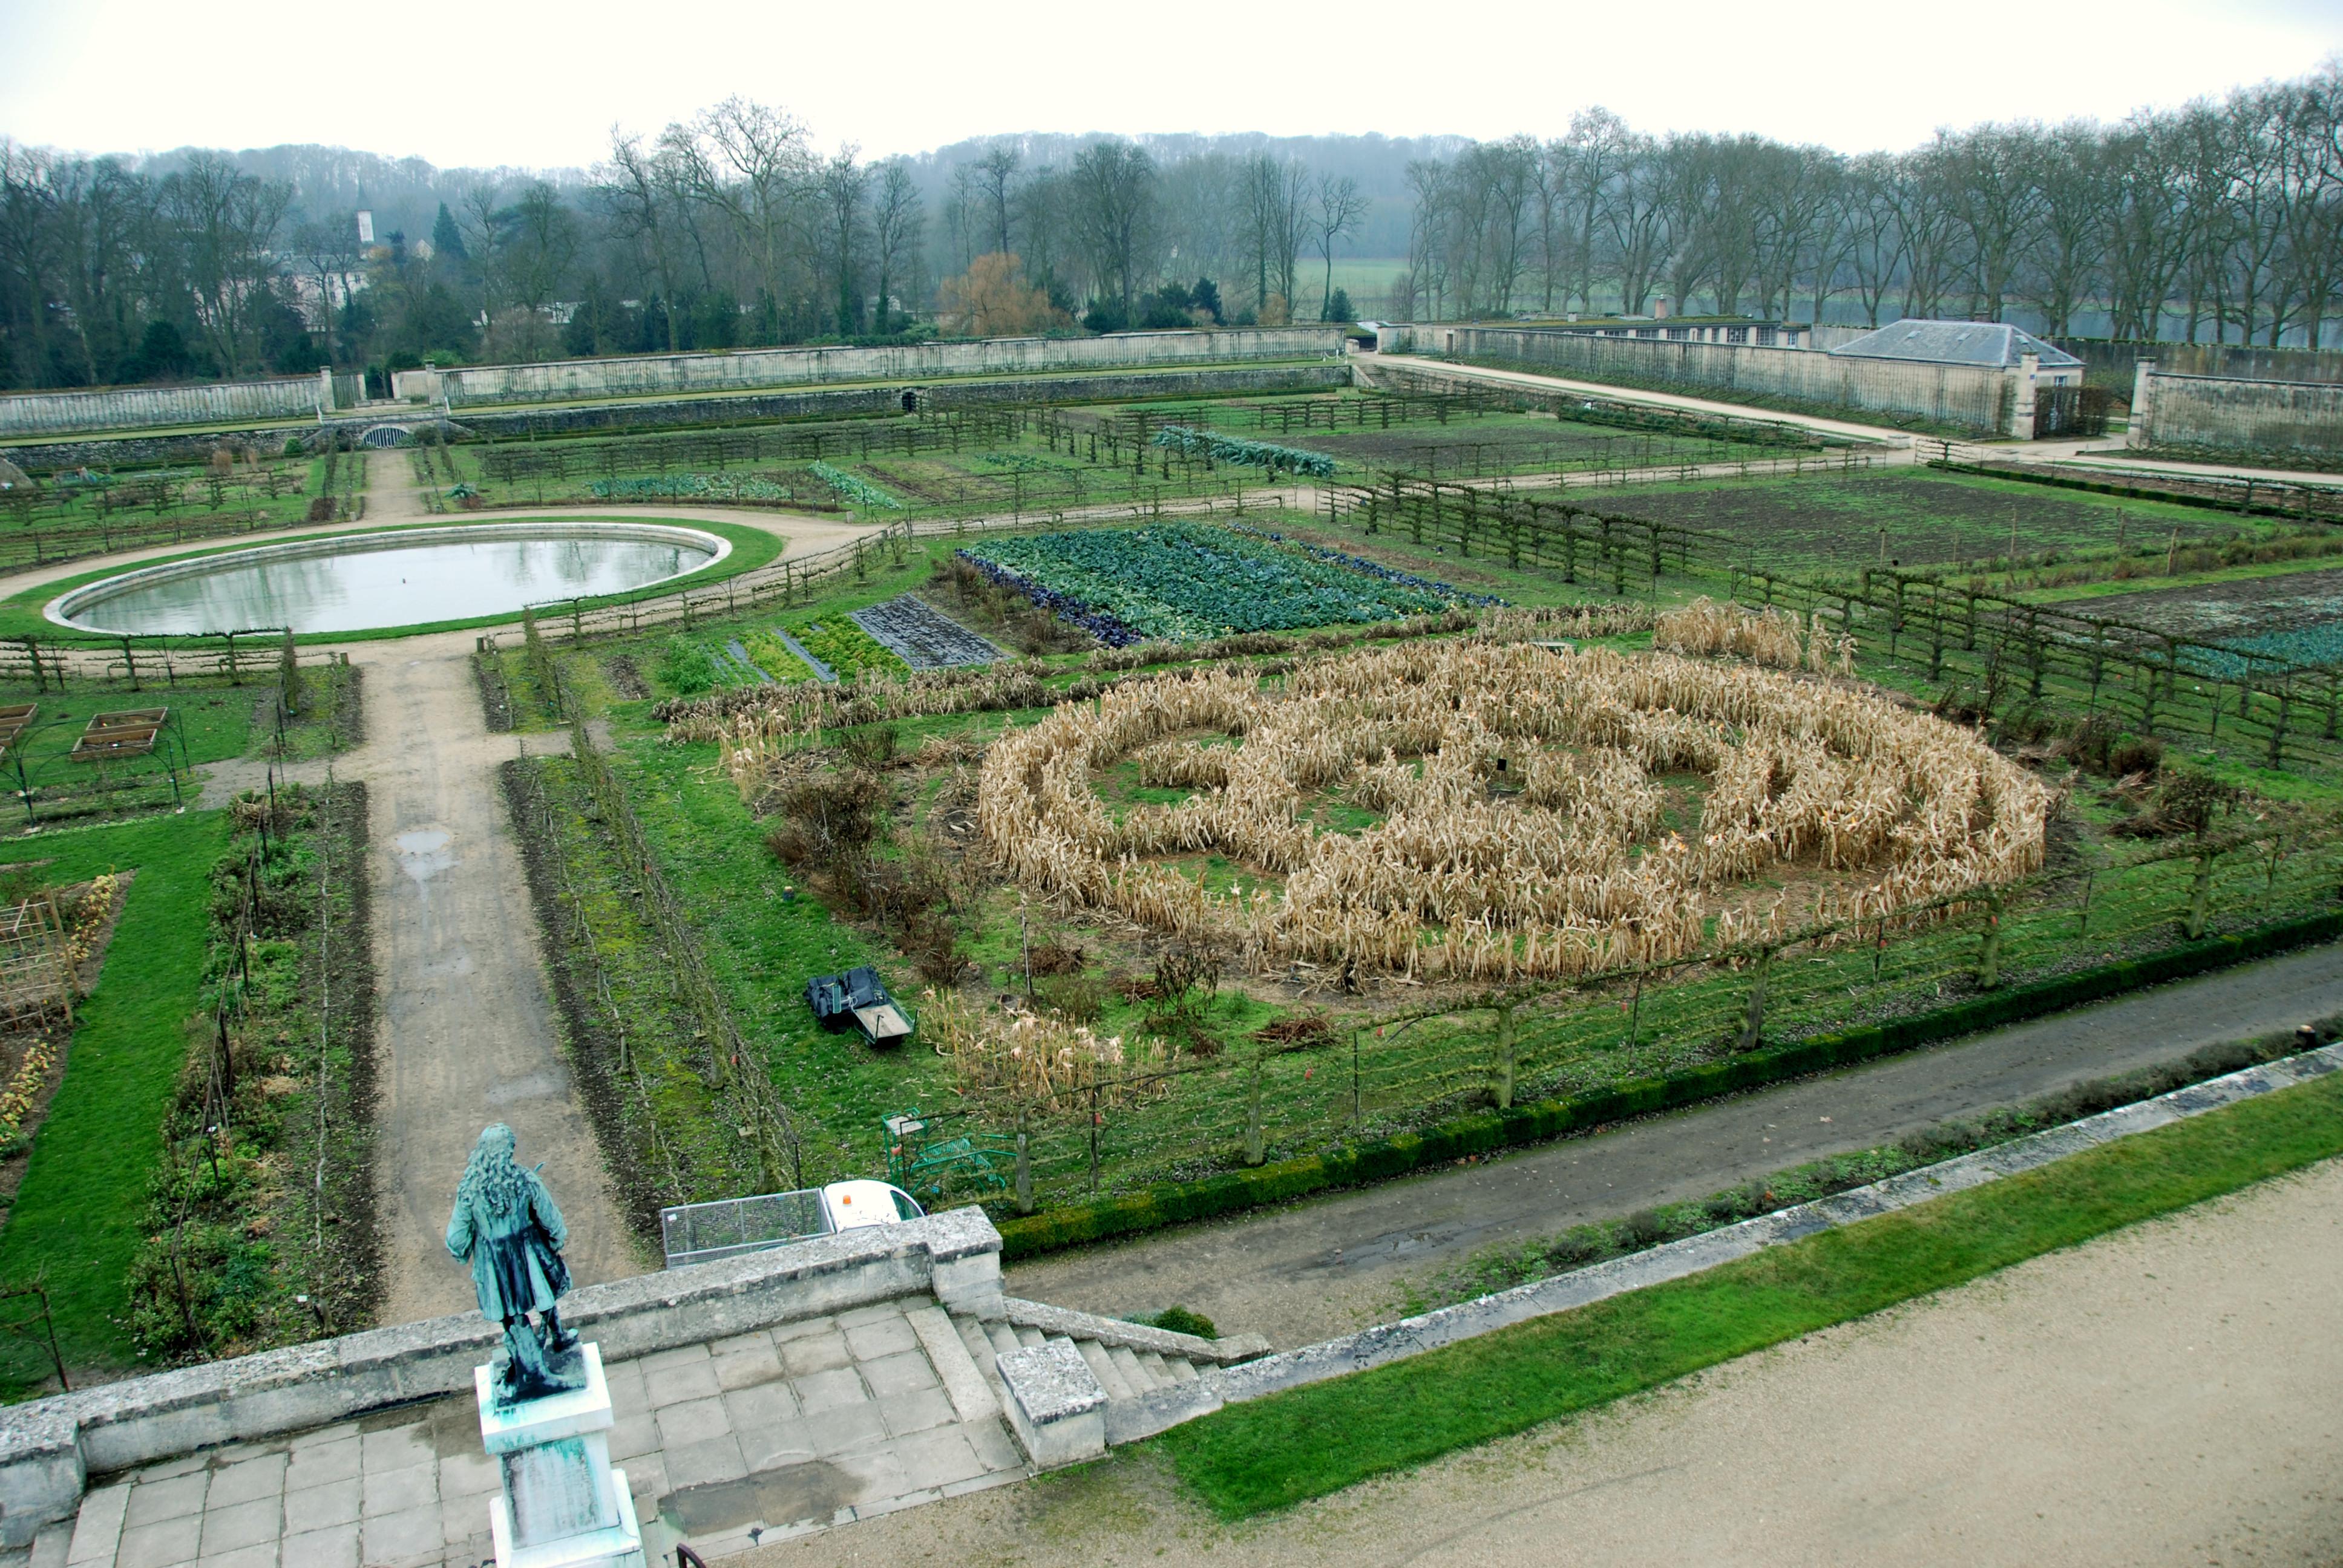 5 centre potager du roi spirale mais le jardin fengshui le jardin feng shui. Black Bedroom Furniture Sets. Home Design Ideas